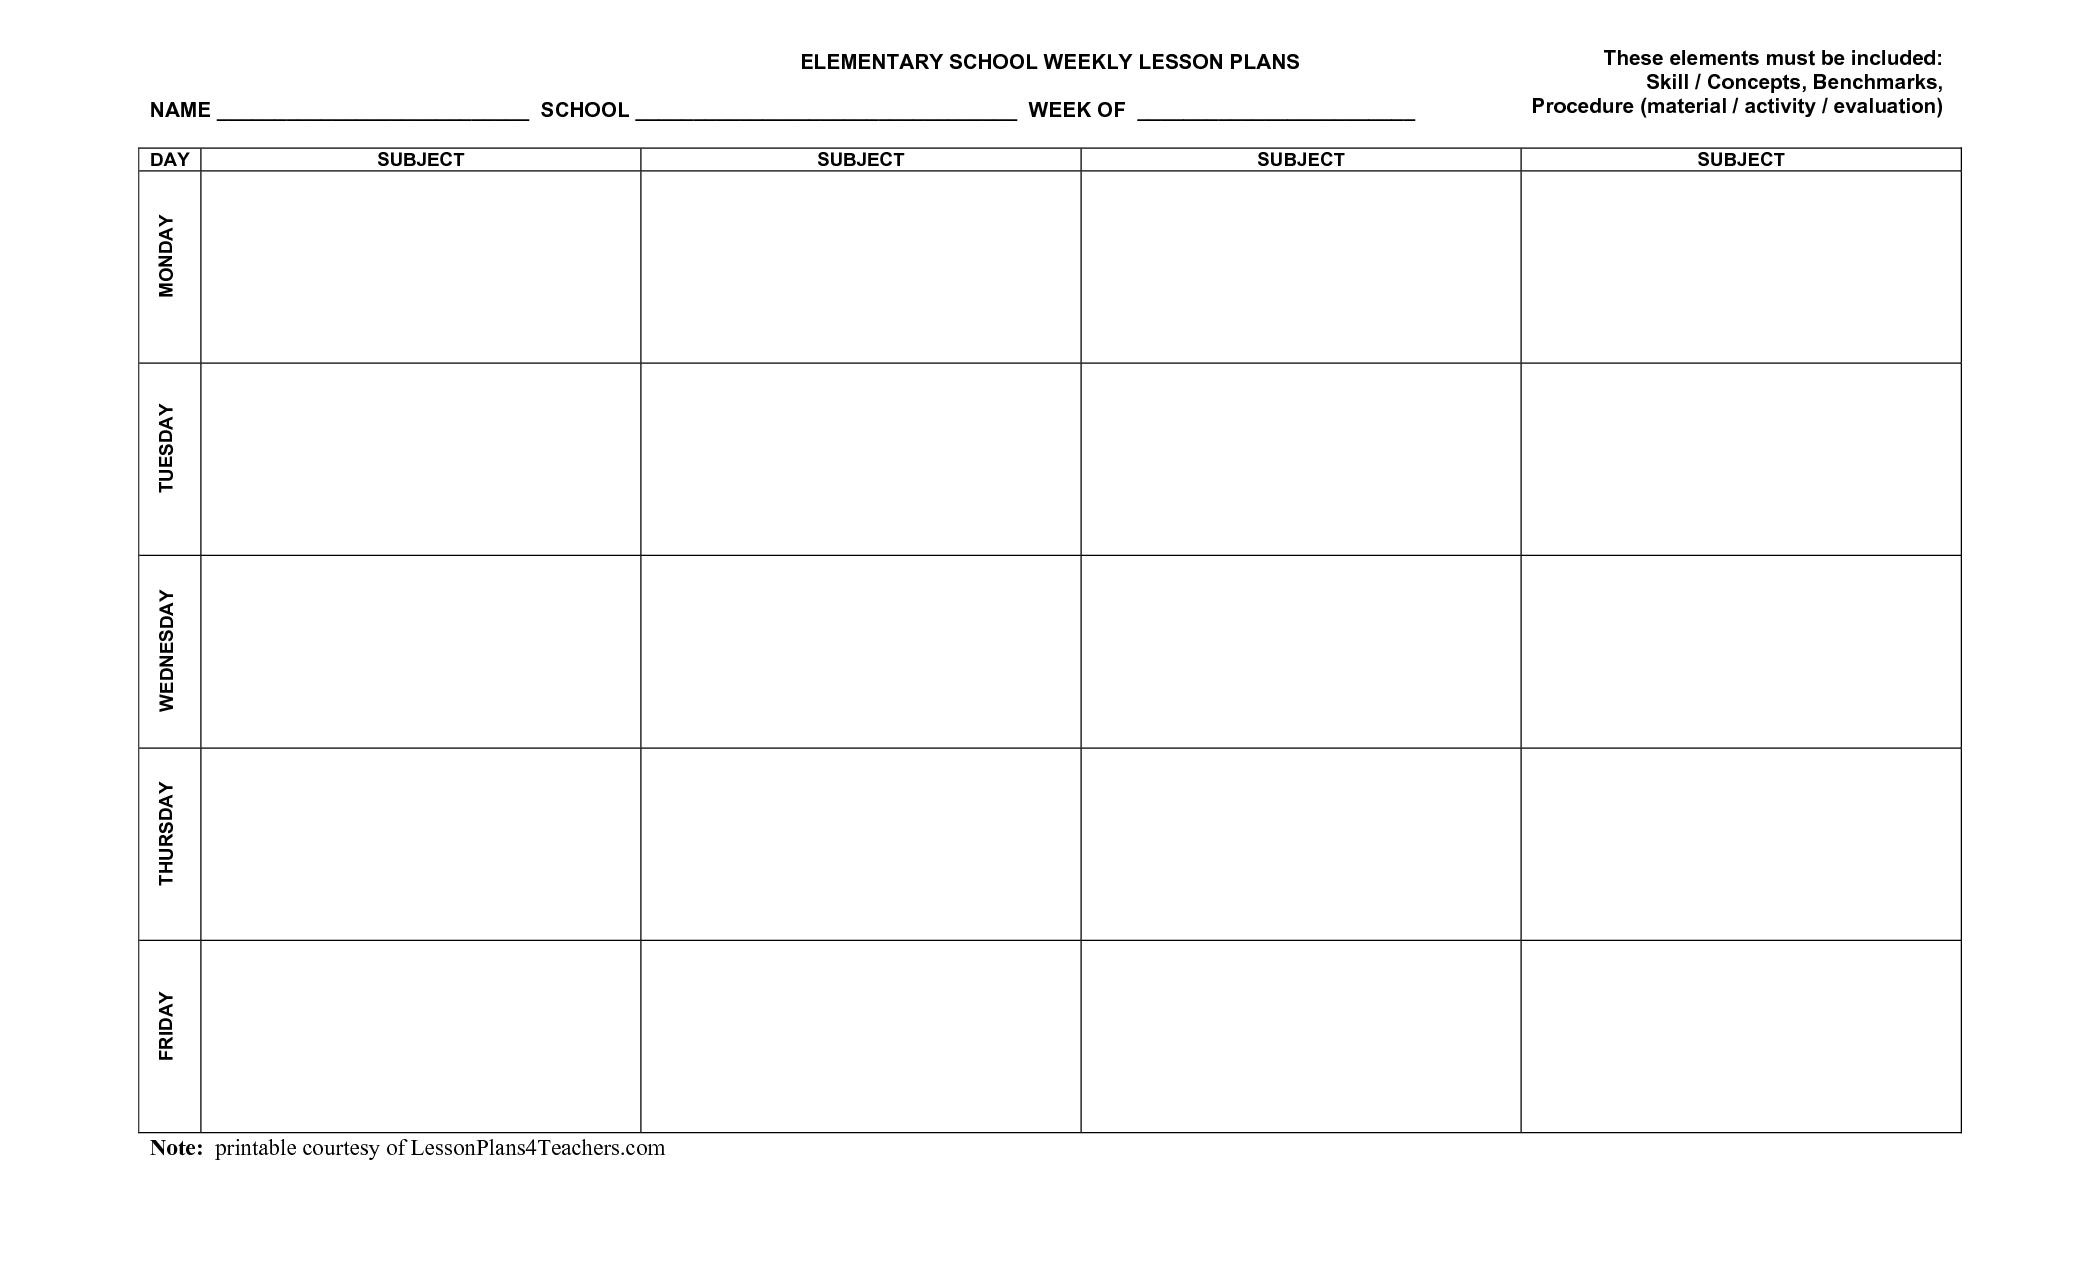 unique weekly lesson plan templates exceltemplate xls. Black Bedroom Furniture Sets. Home Design Ideas